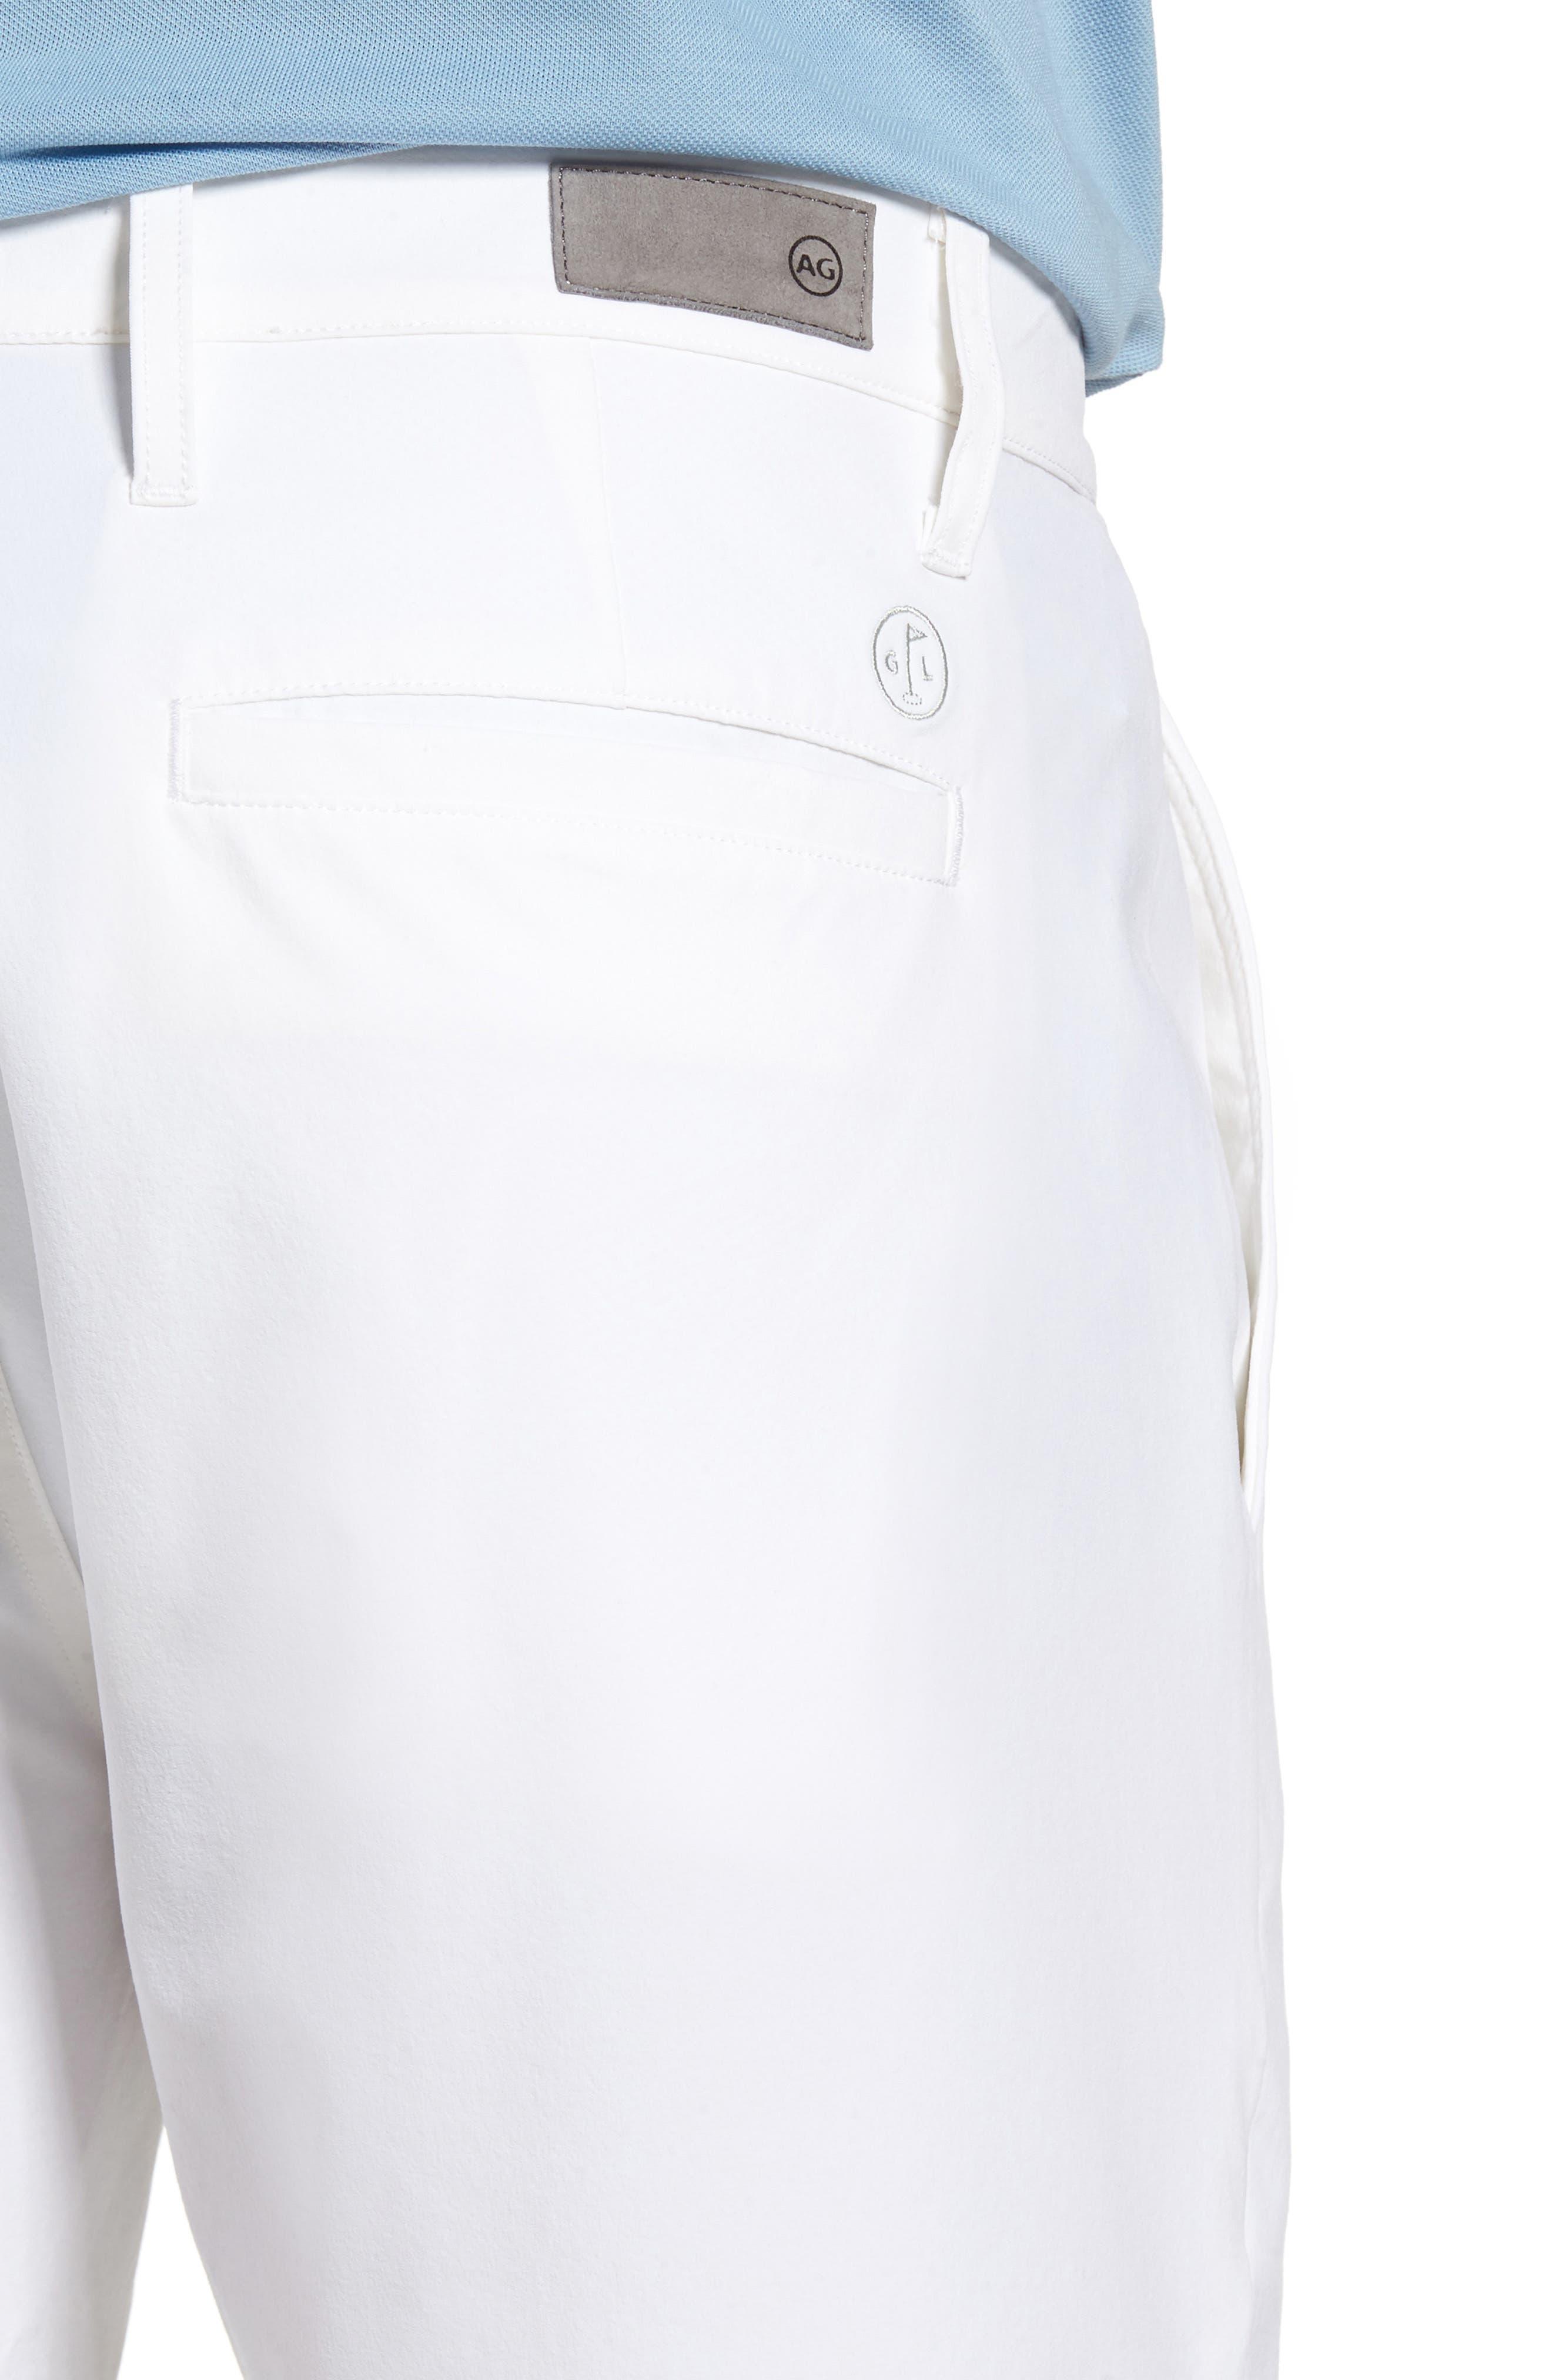 Canyon Shorts,                             Alternate thumbnail 4, color,                             Bright White